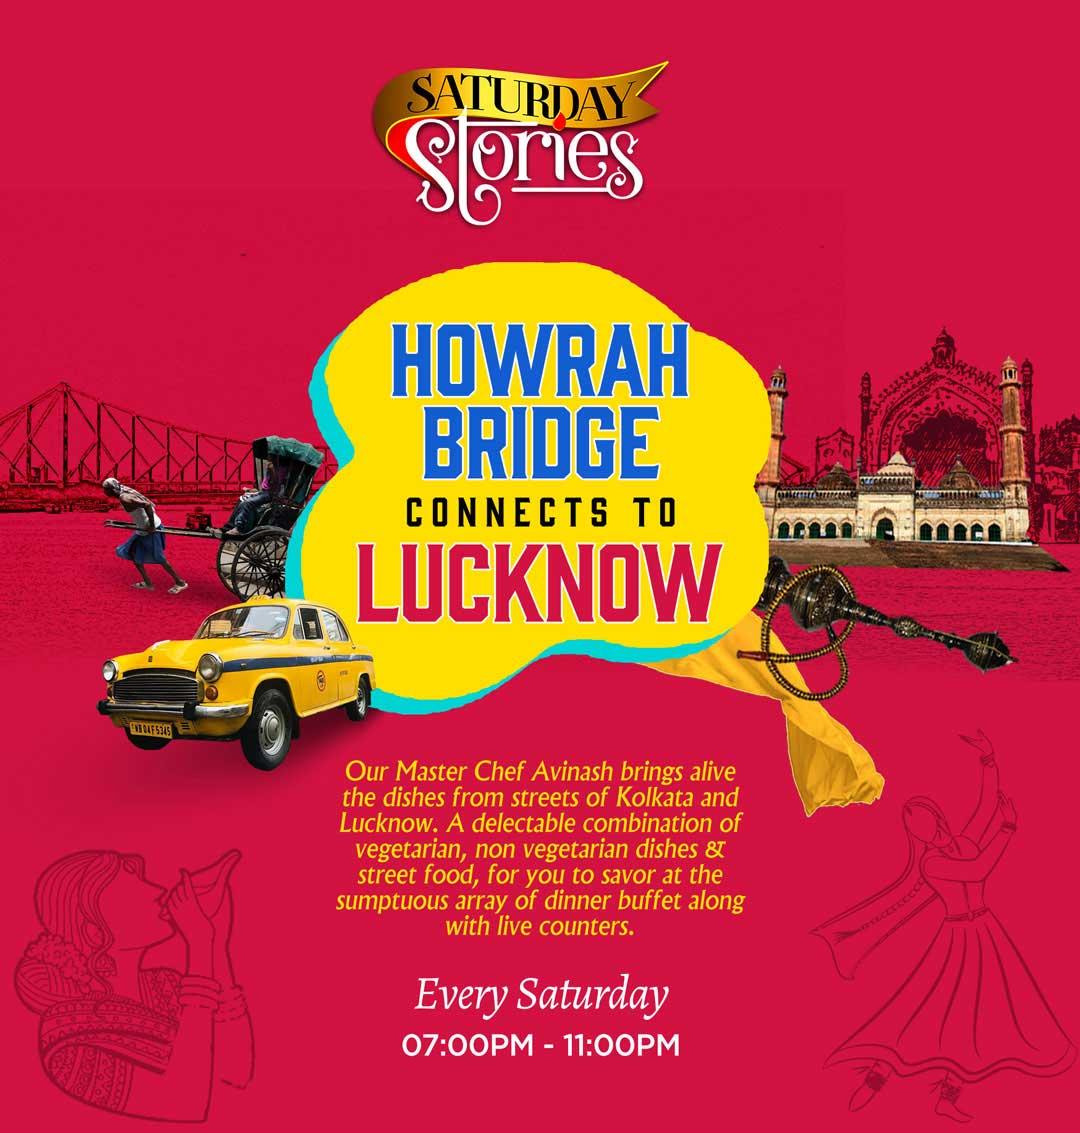 Saturday-Stories-Weekend-Dining-Ramada-Lucknow